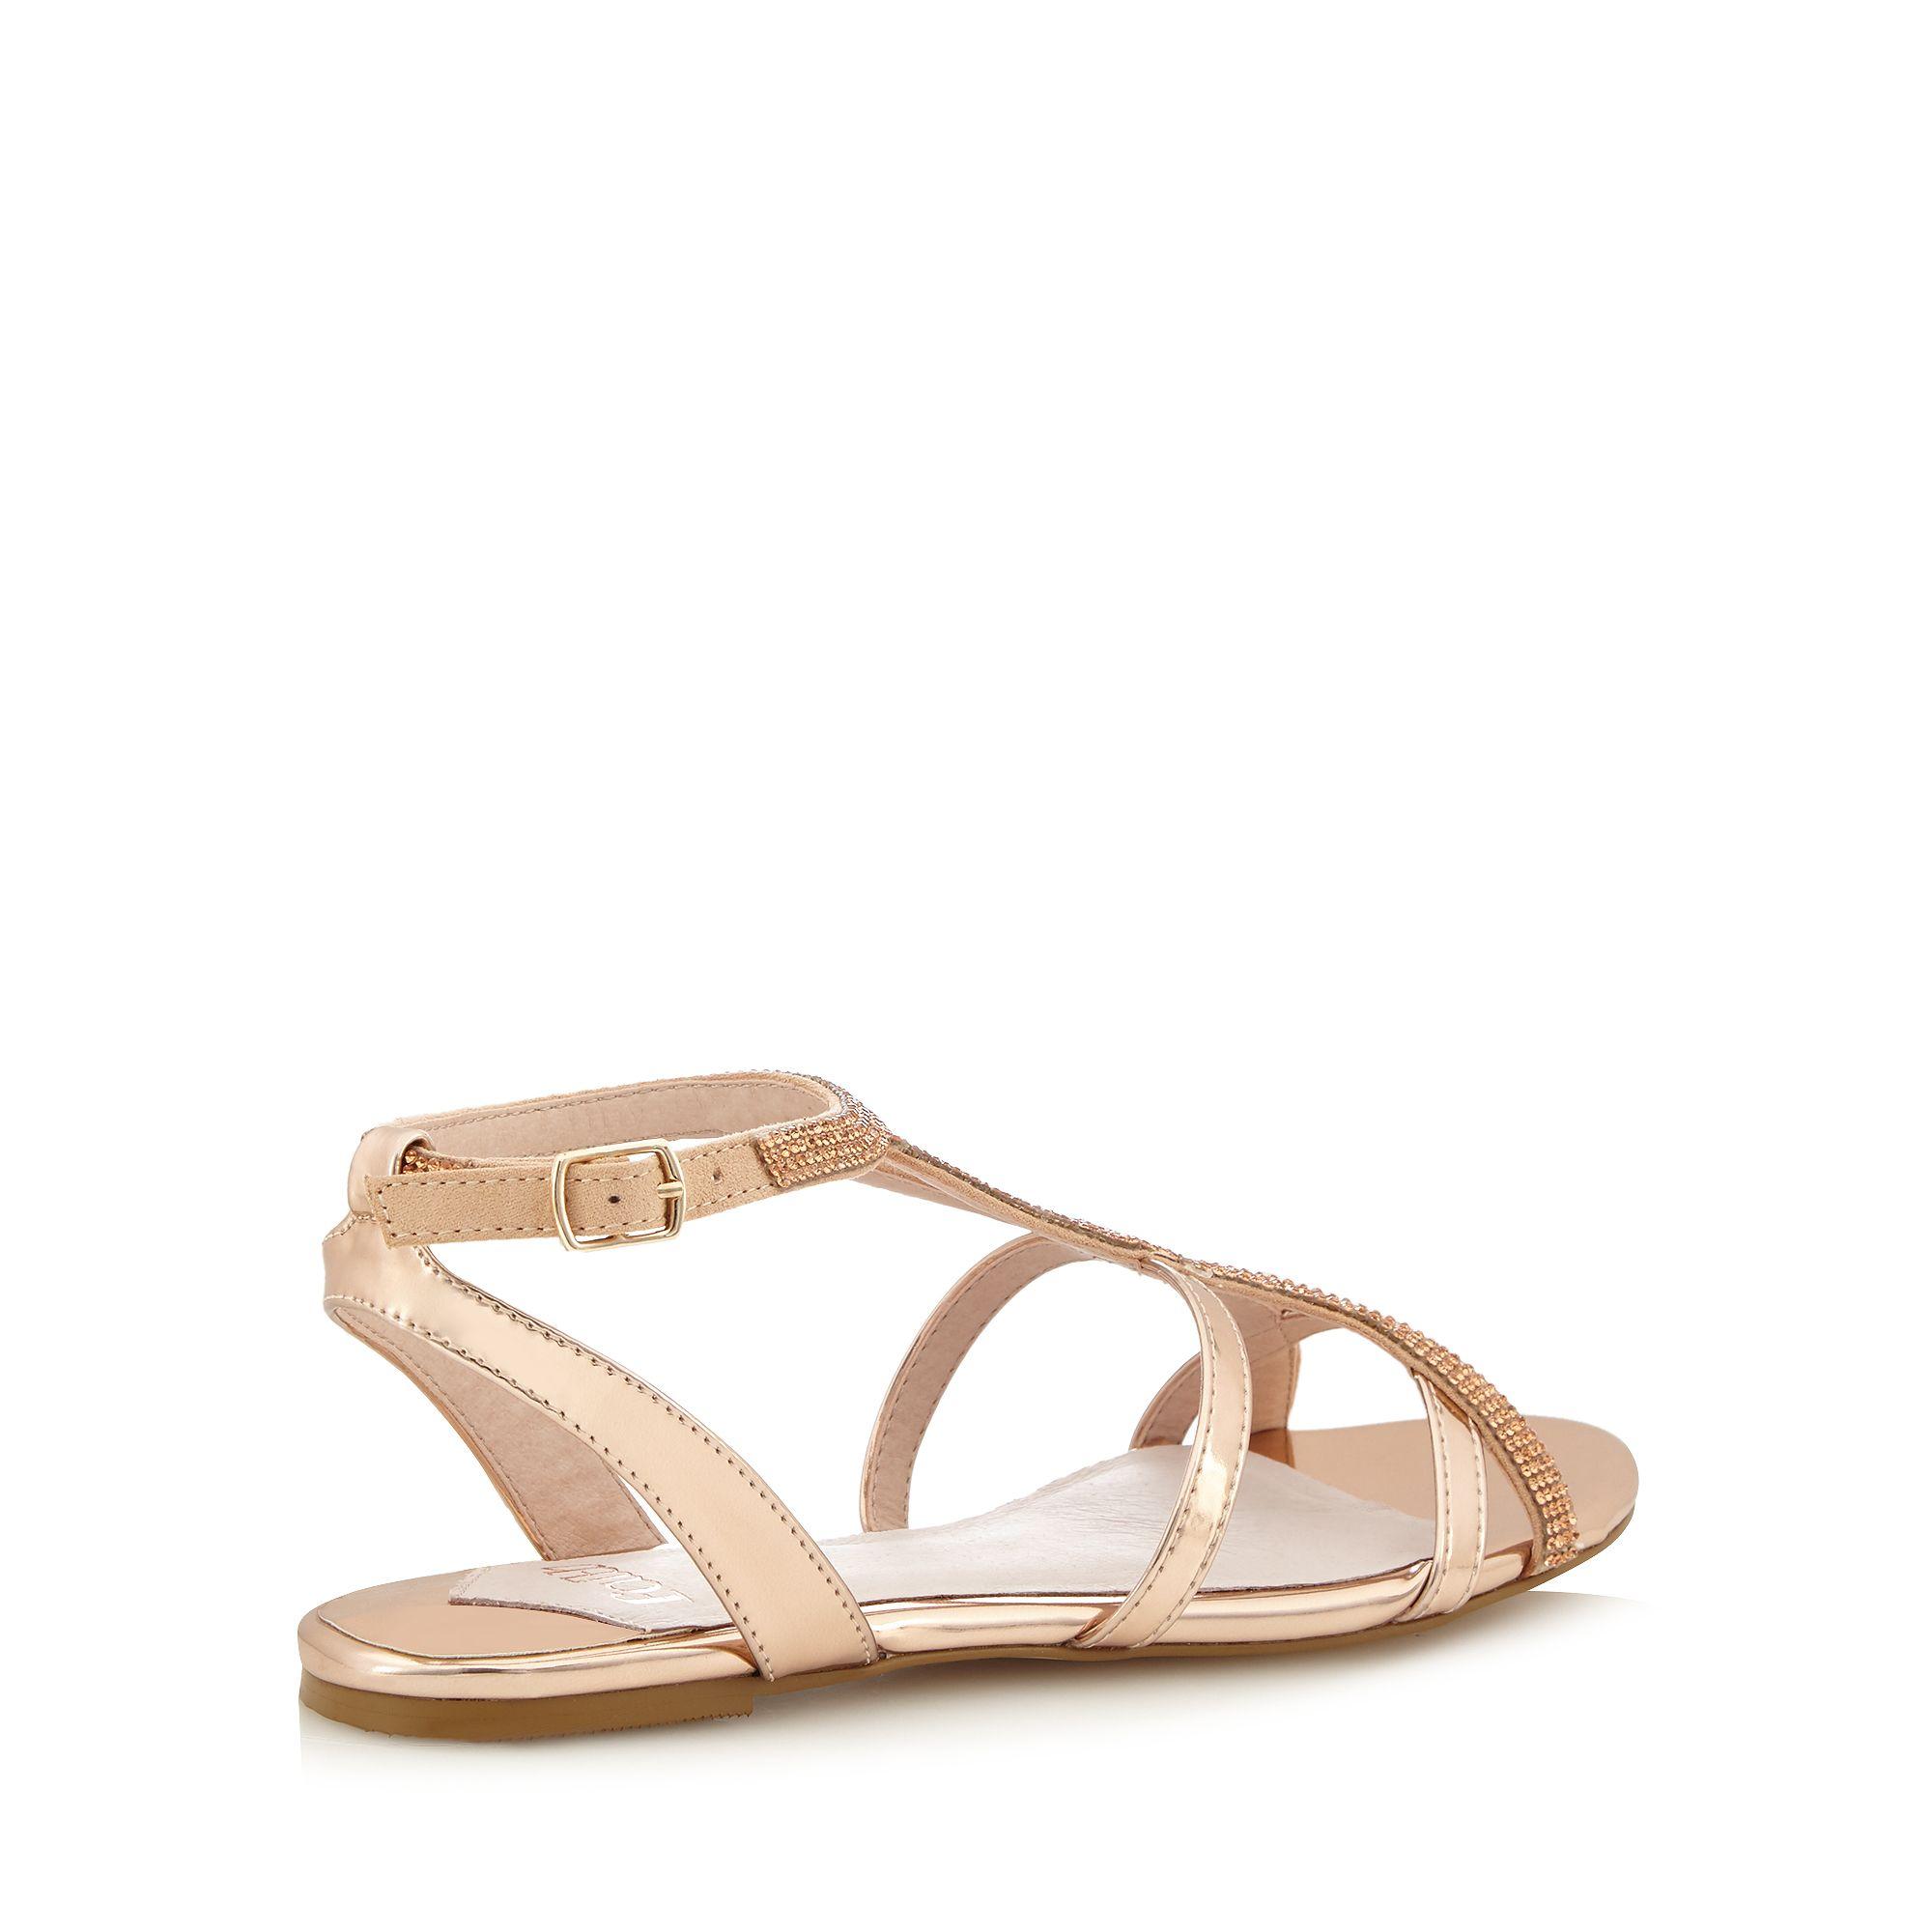 Debenhams Shoes Flat Sandles